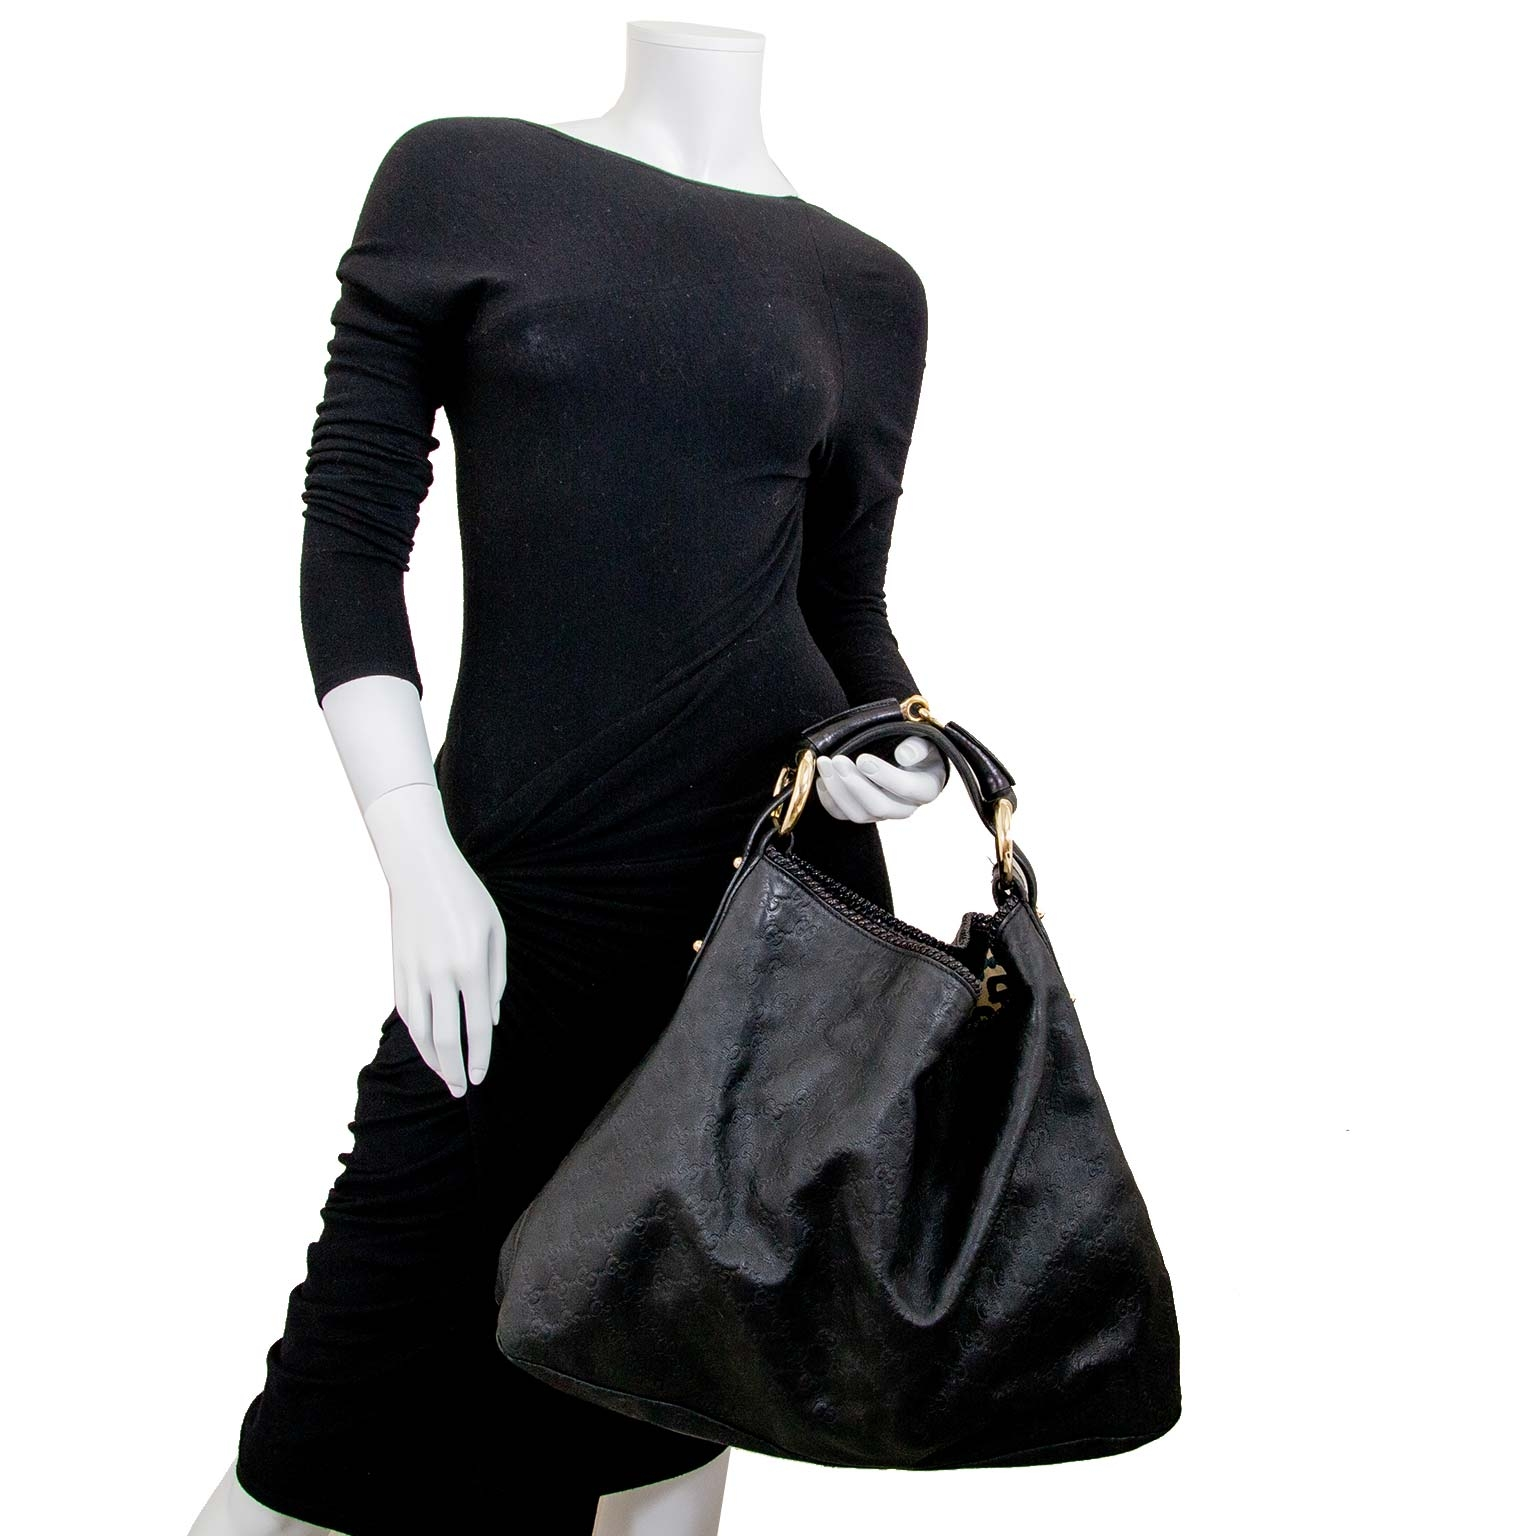 Gucci black leather monogram large horsebit hobo bag now for sale at labellov vintage fashion webshop belgium